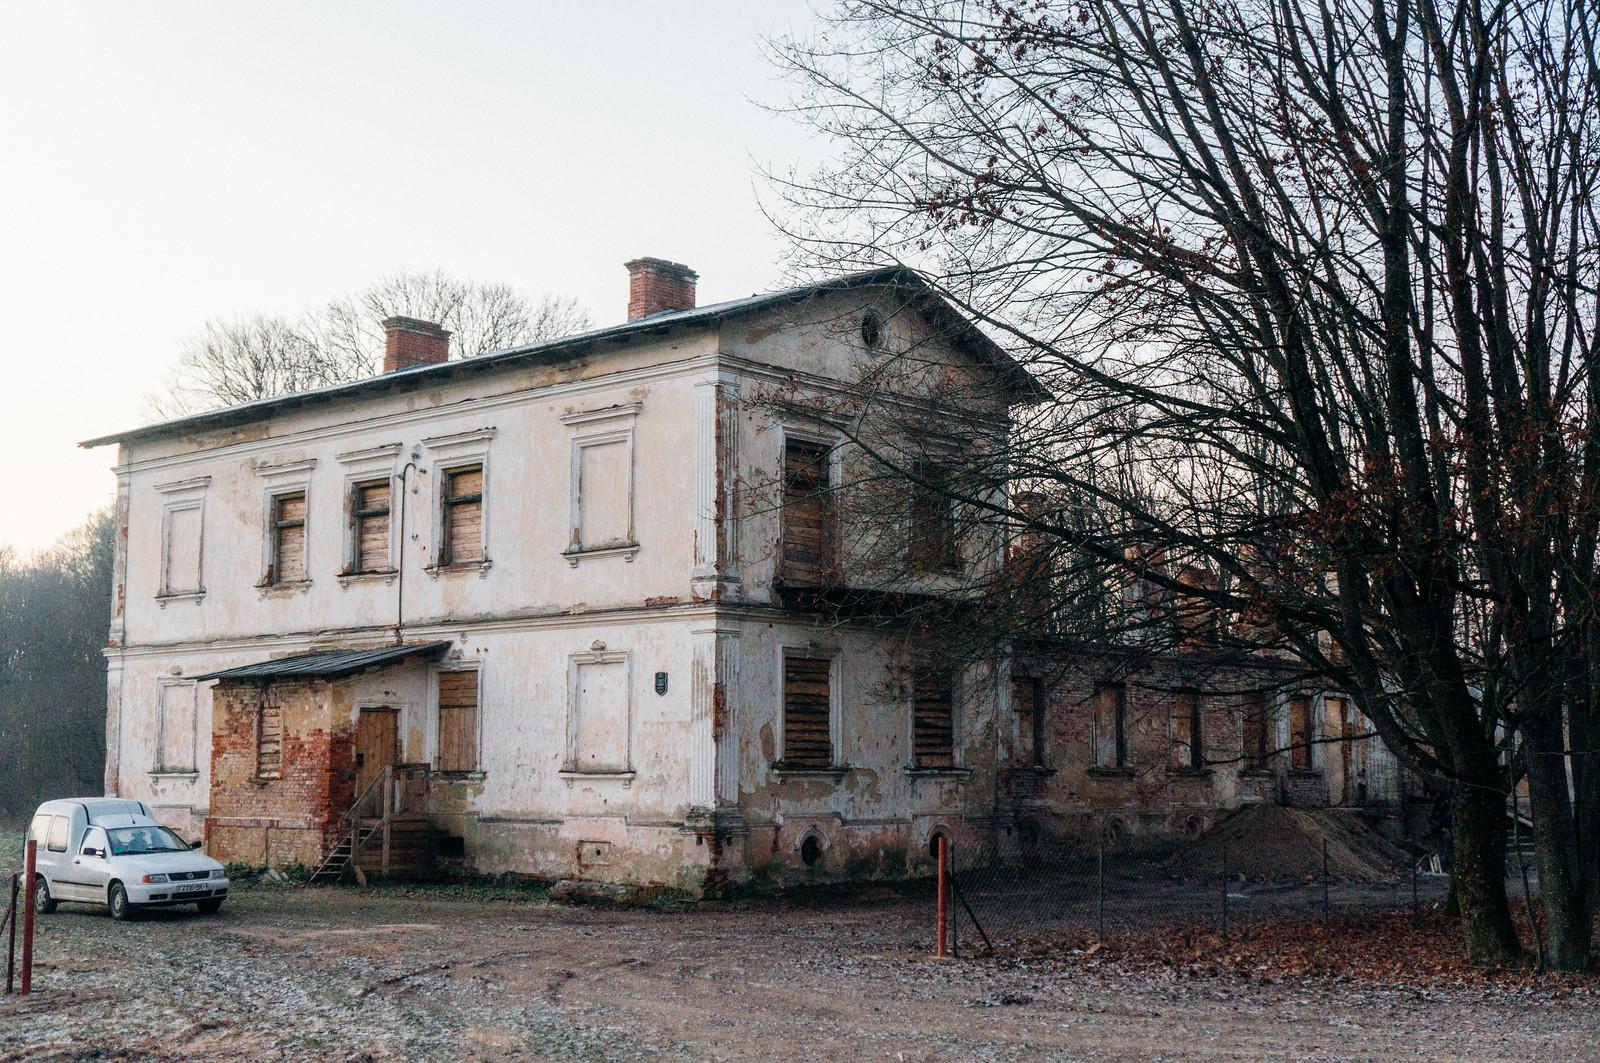 url], on Flickr - Велопокатушка: Тевли - Селец - Ивацевичи 2019. ОТЧЁТ.